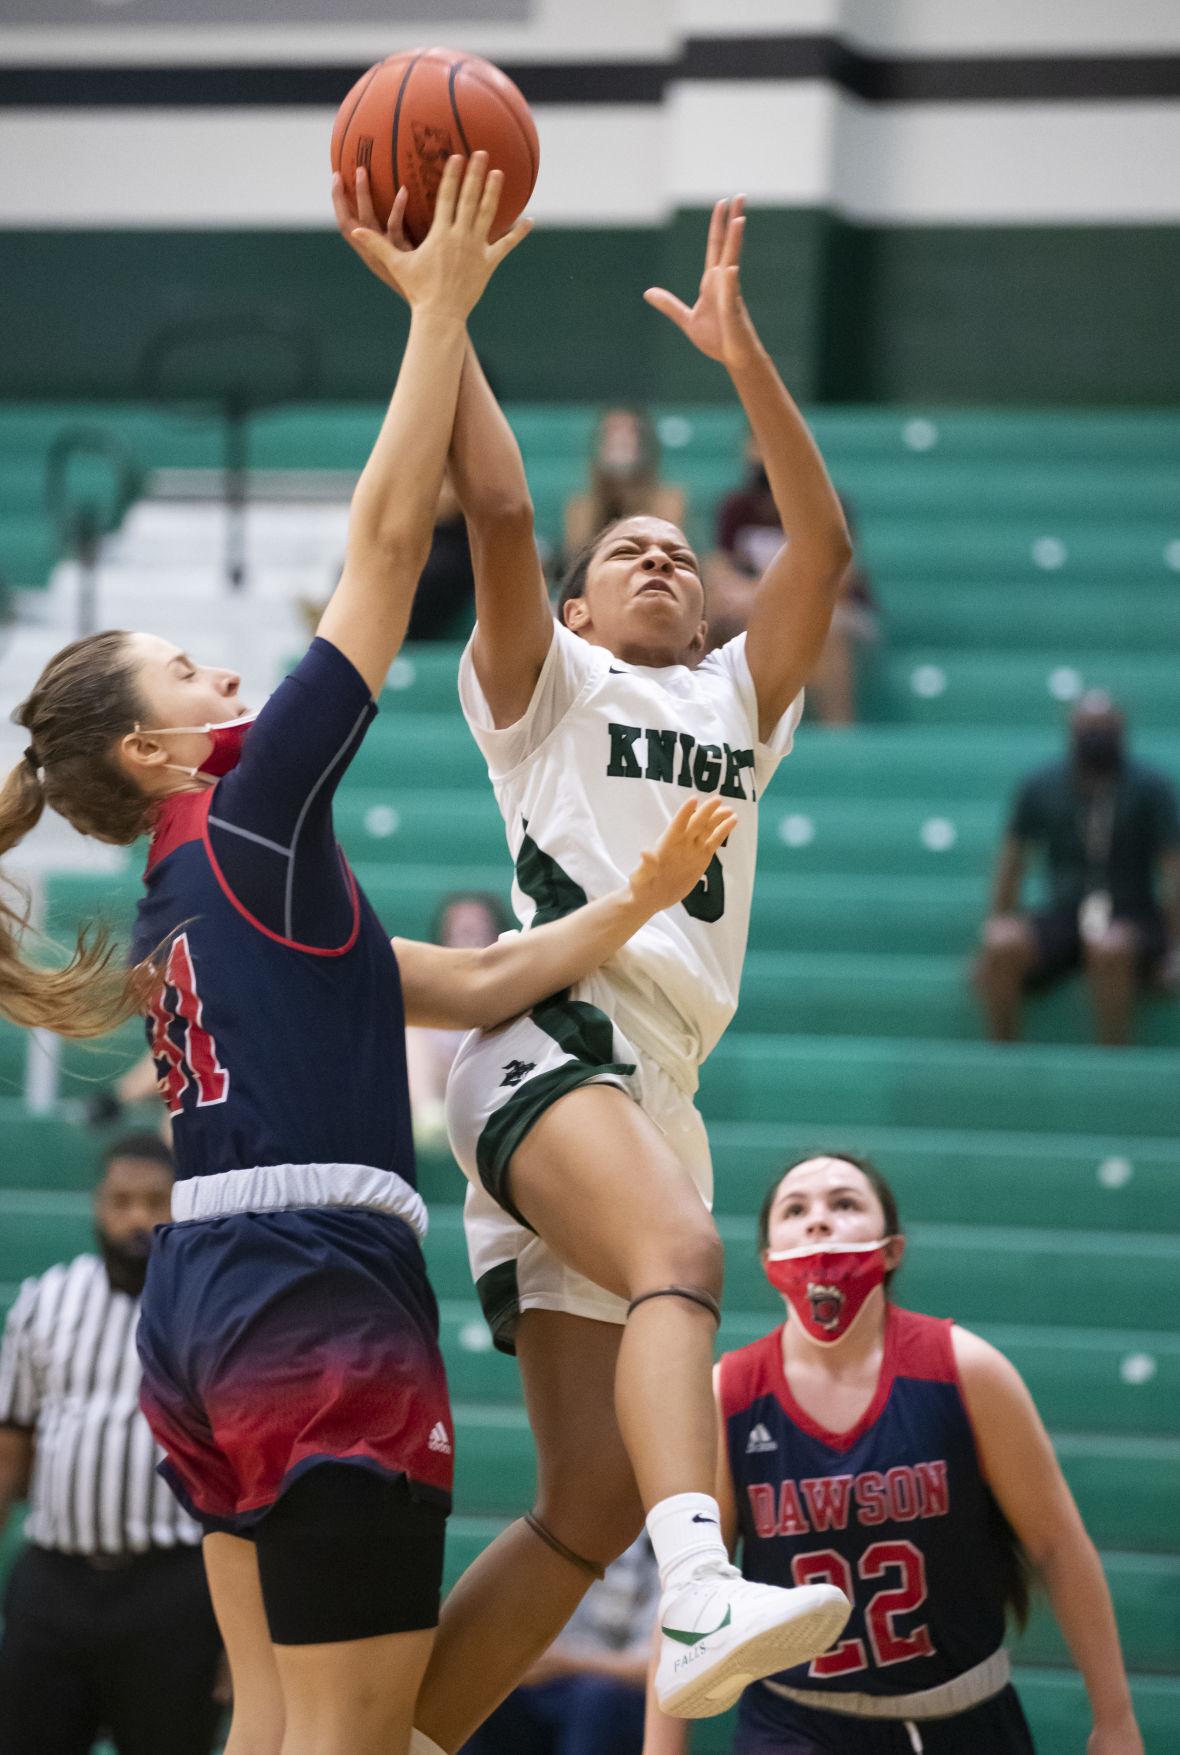 Clear Falls vs Pearland Dawson Girls Basketball